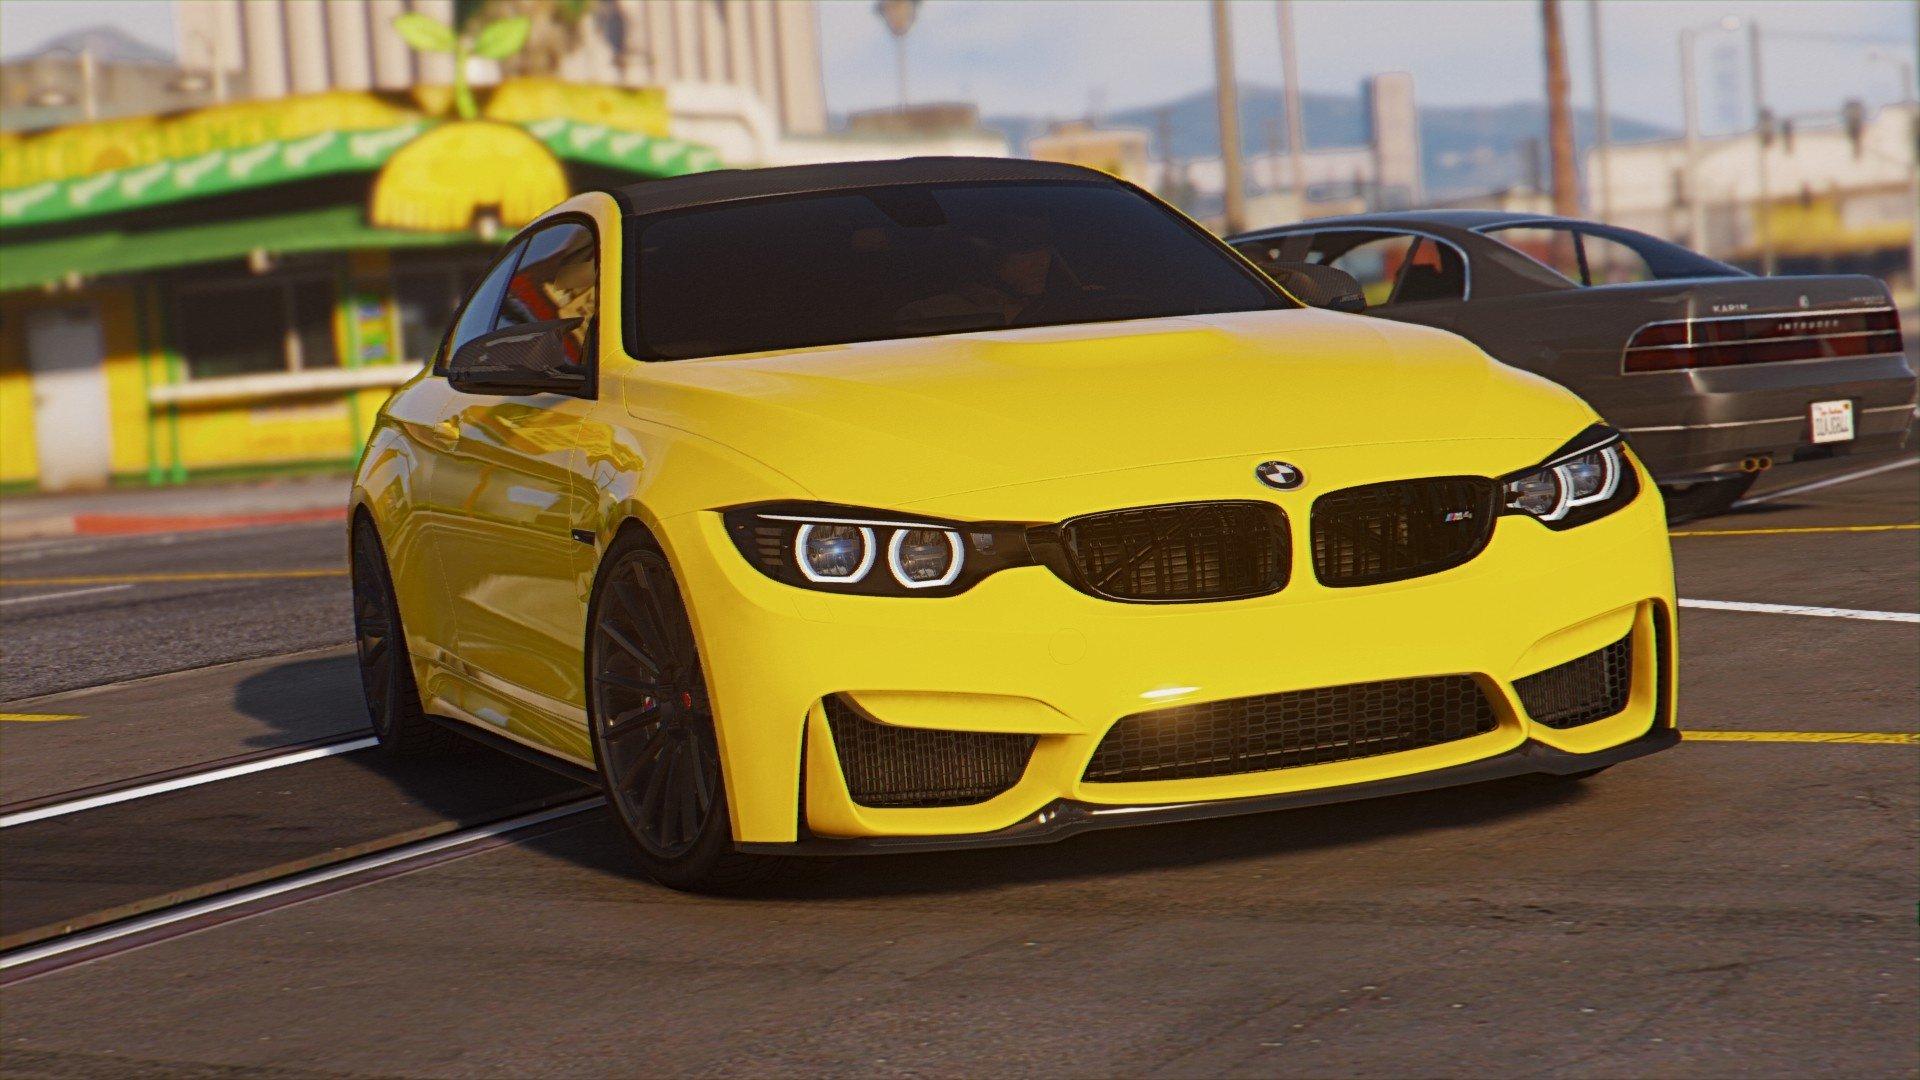 2015 Jeep Rubicon >> 2015 BMW F82 M4 [Add-On | Tuning | Bodykits] - GTA5-Mods.com